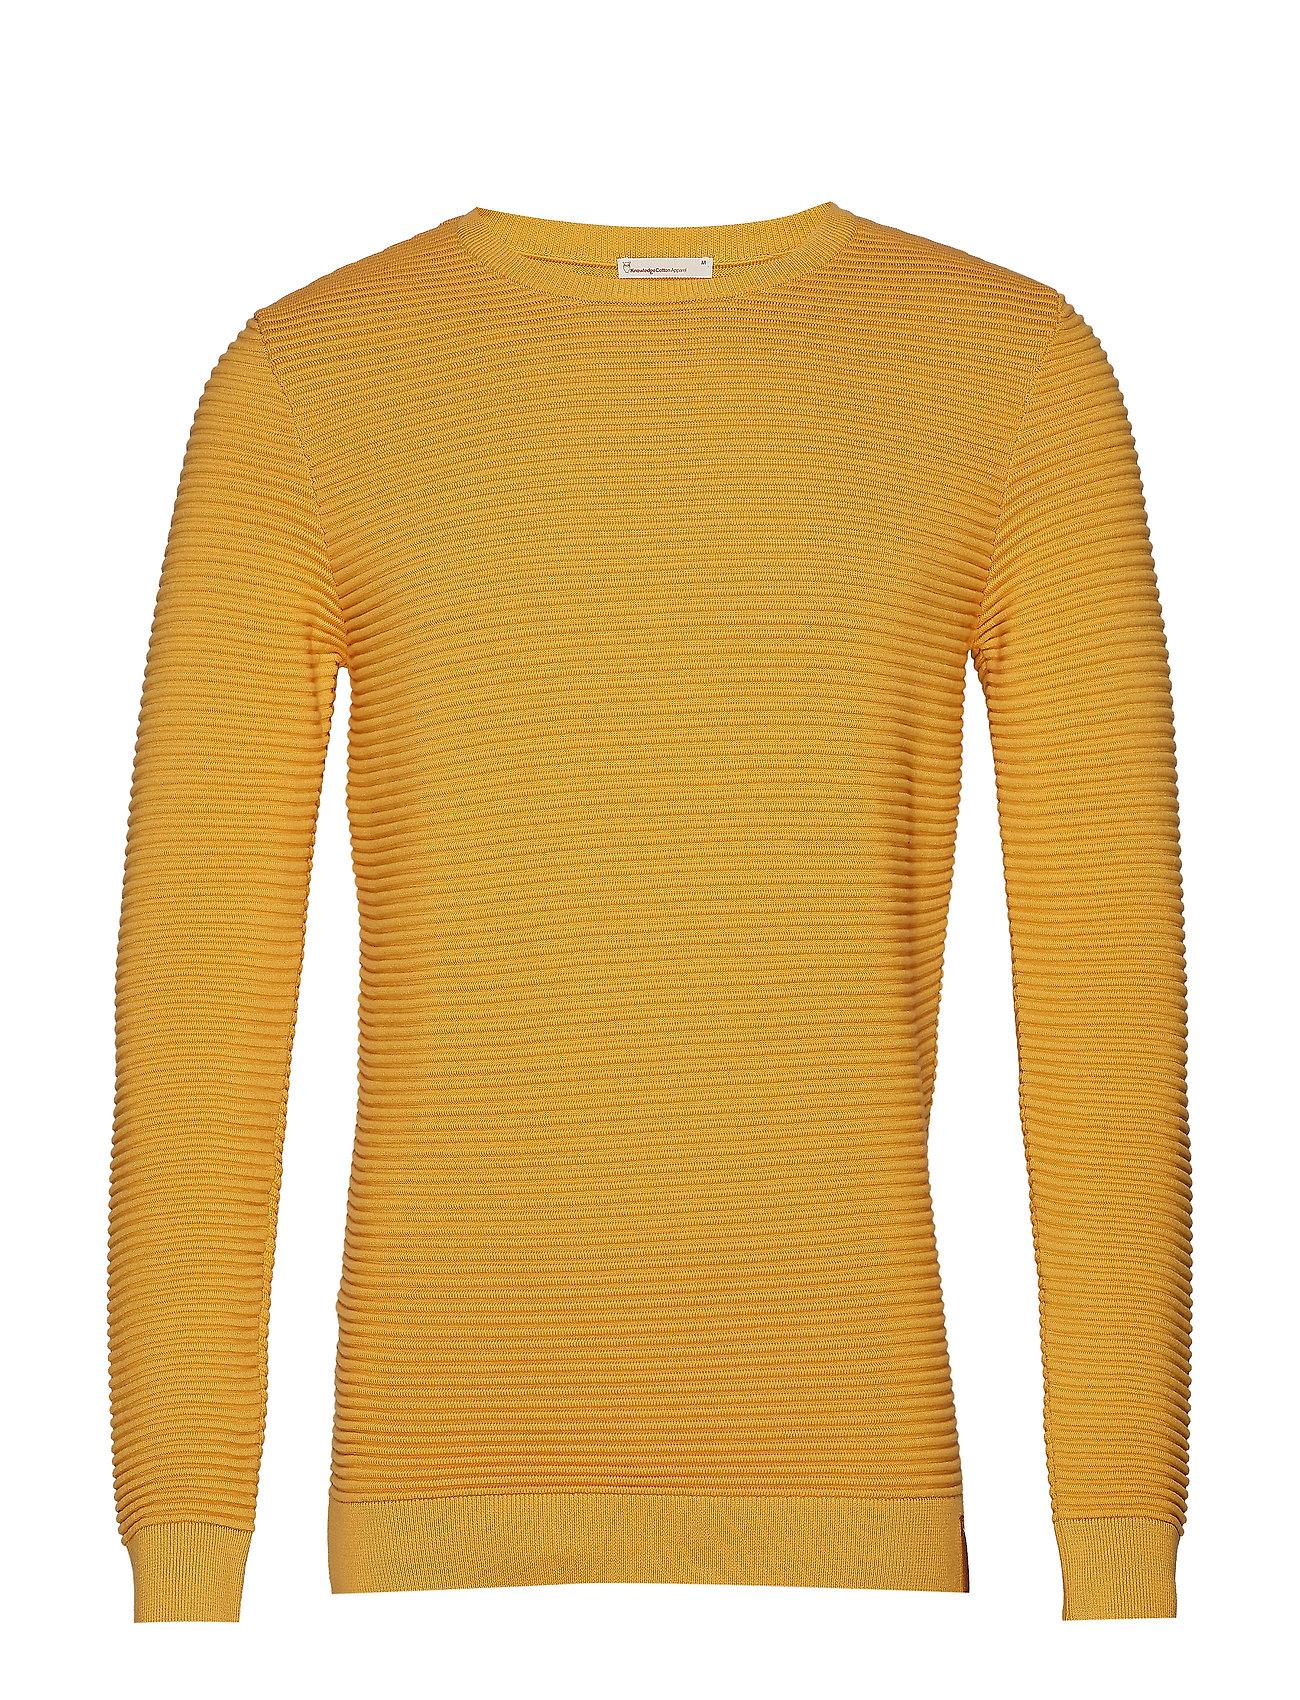 Knowledge Cotton Apparel FIELD o-neck knit - BANANA